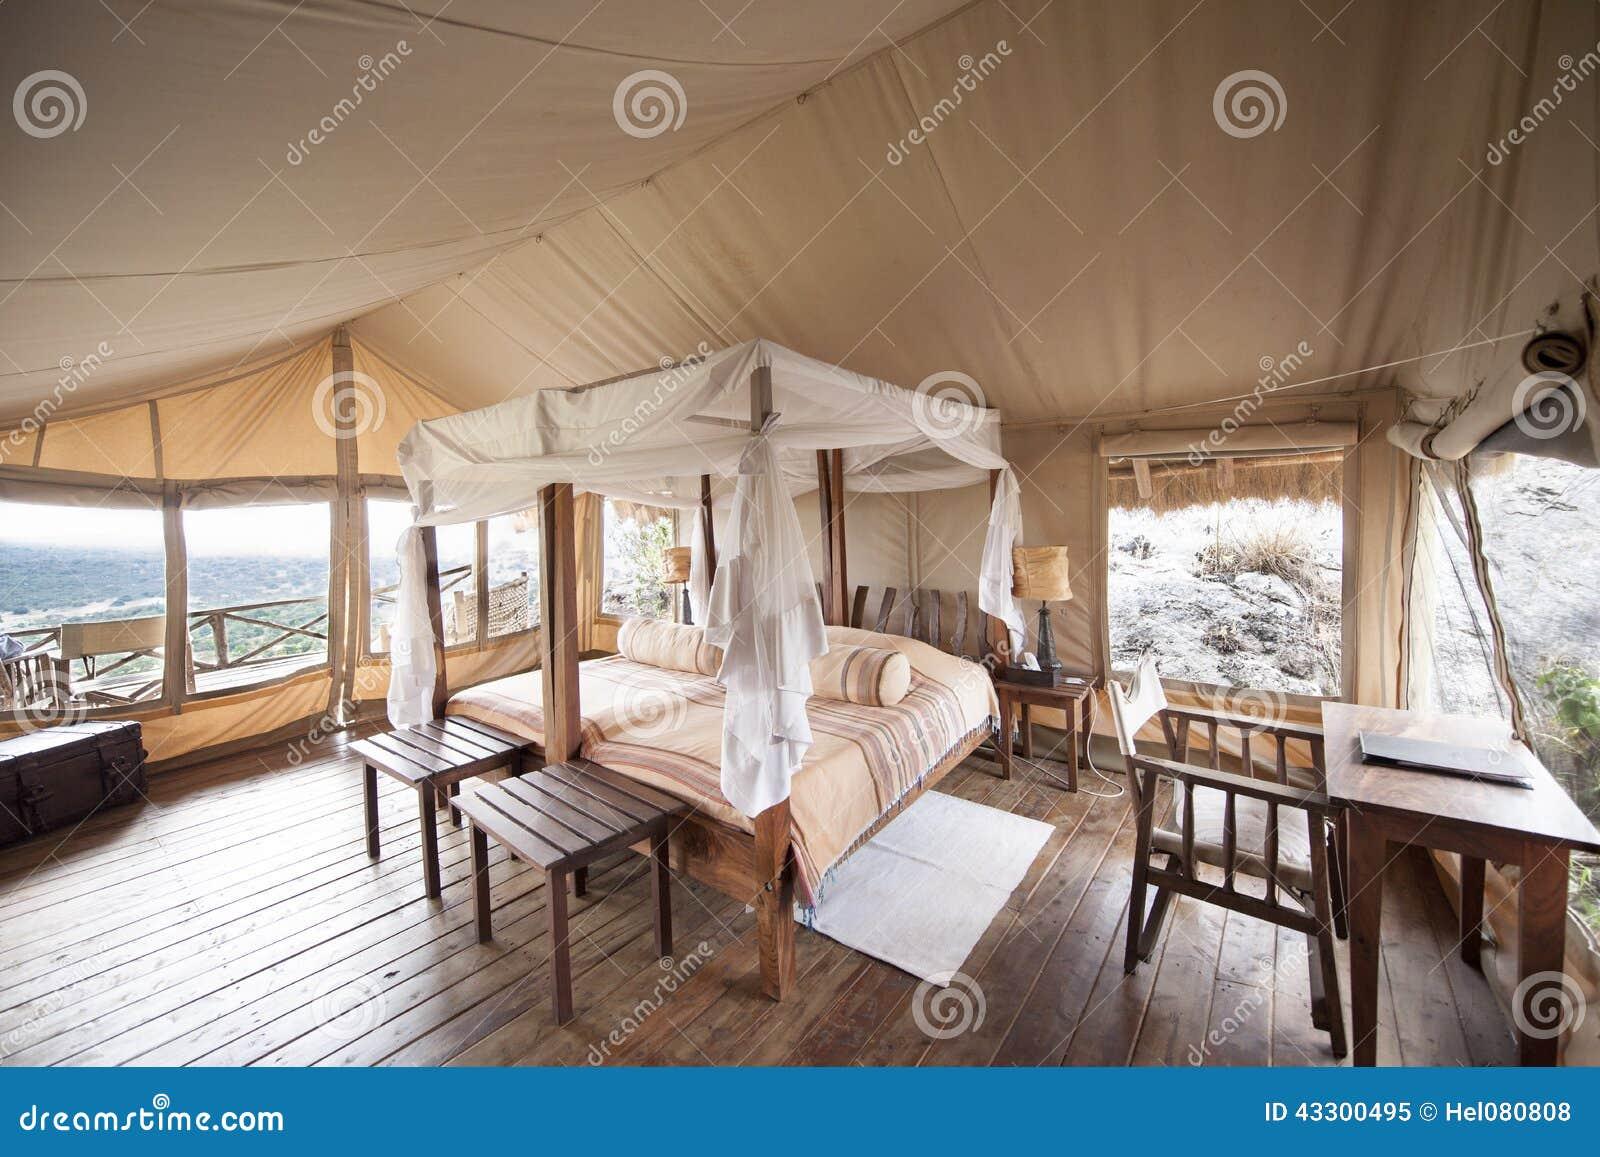 Download Luxury Safari Tent Uganda stock image. Image of canopy - 43300495 & Luxury Safari Tent Uganda stock image. Image of canopy - 43300495